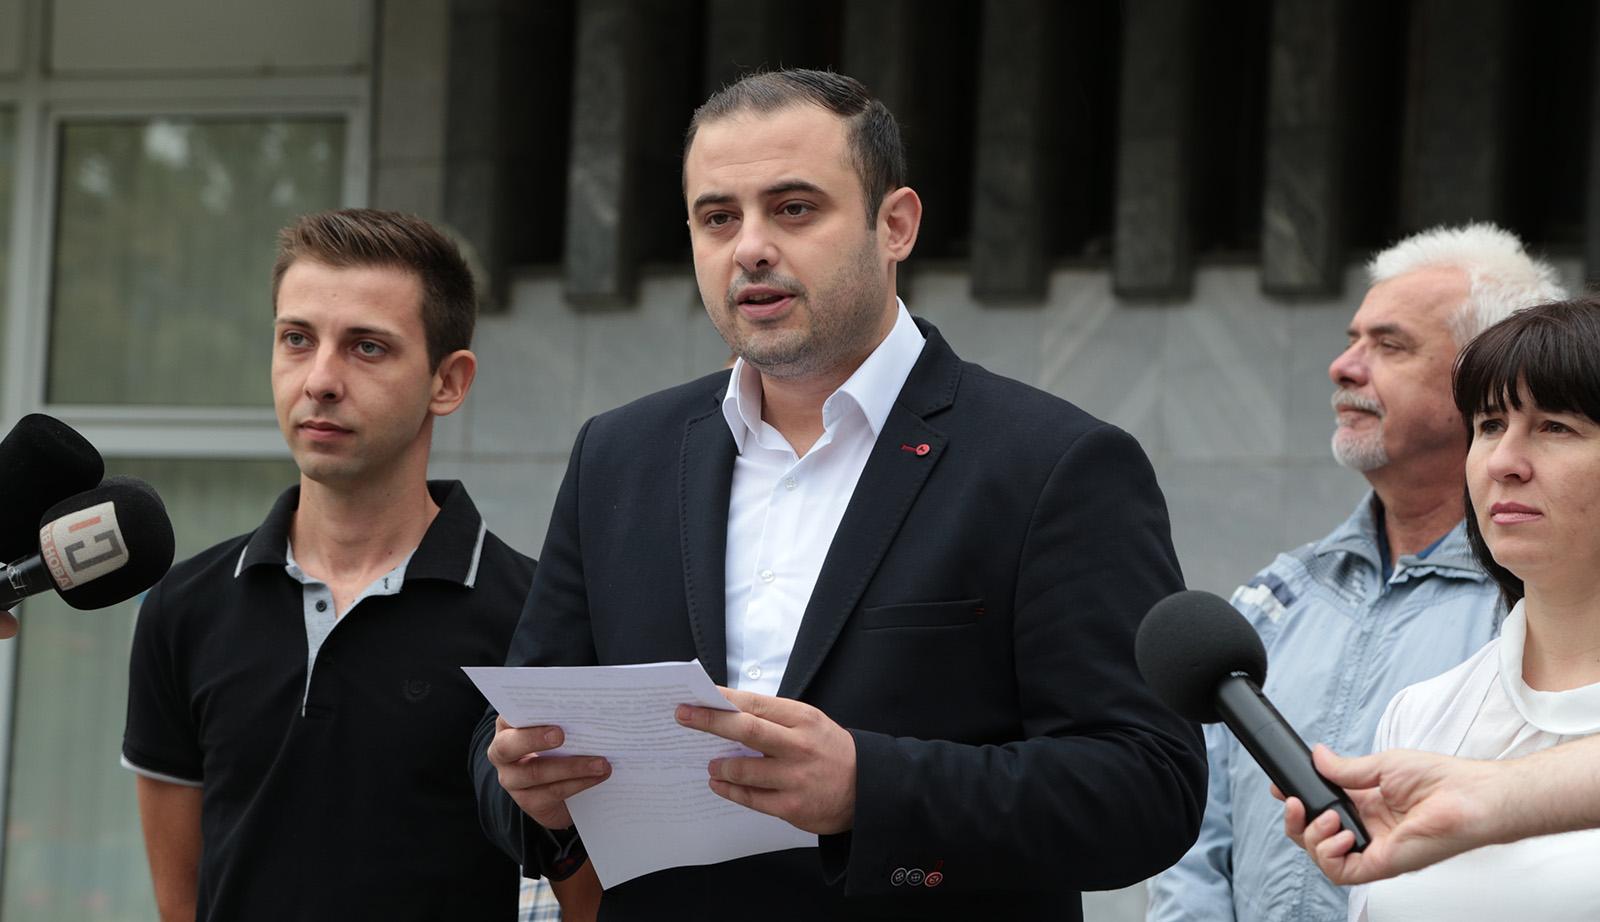 Ѓорѓиевски  СЈО води органзирана хајка против ВМРО ДПМНЕ